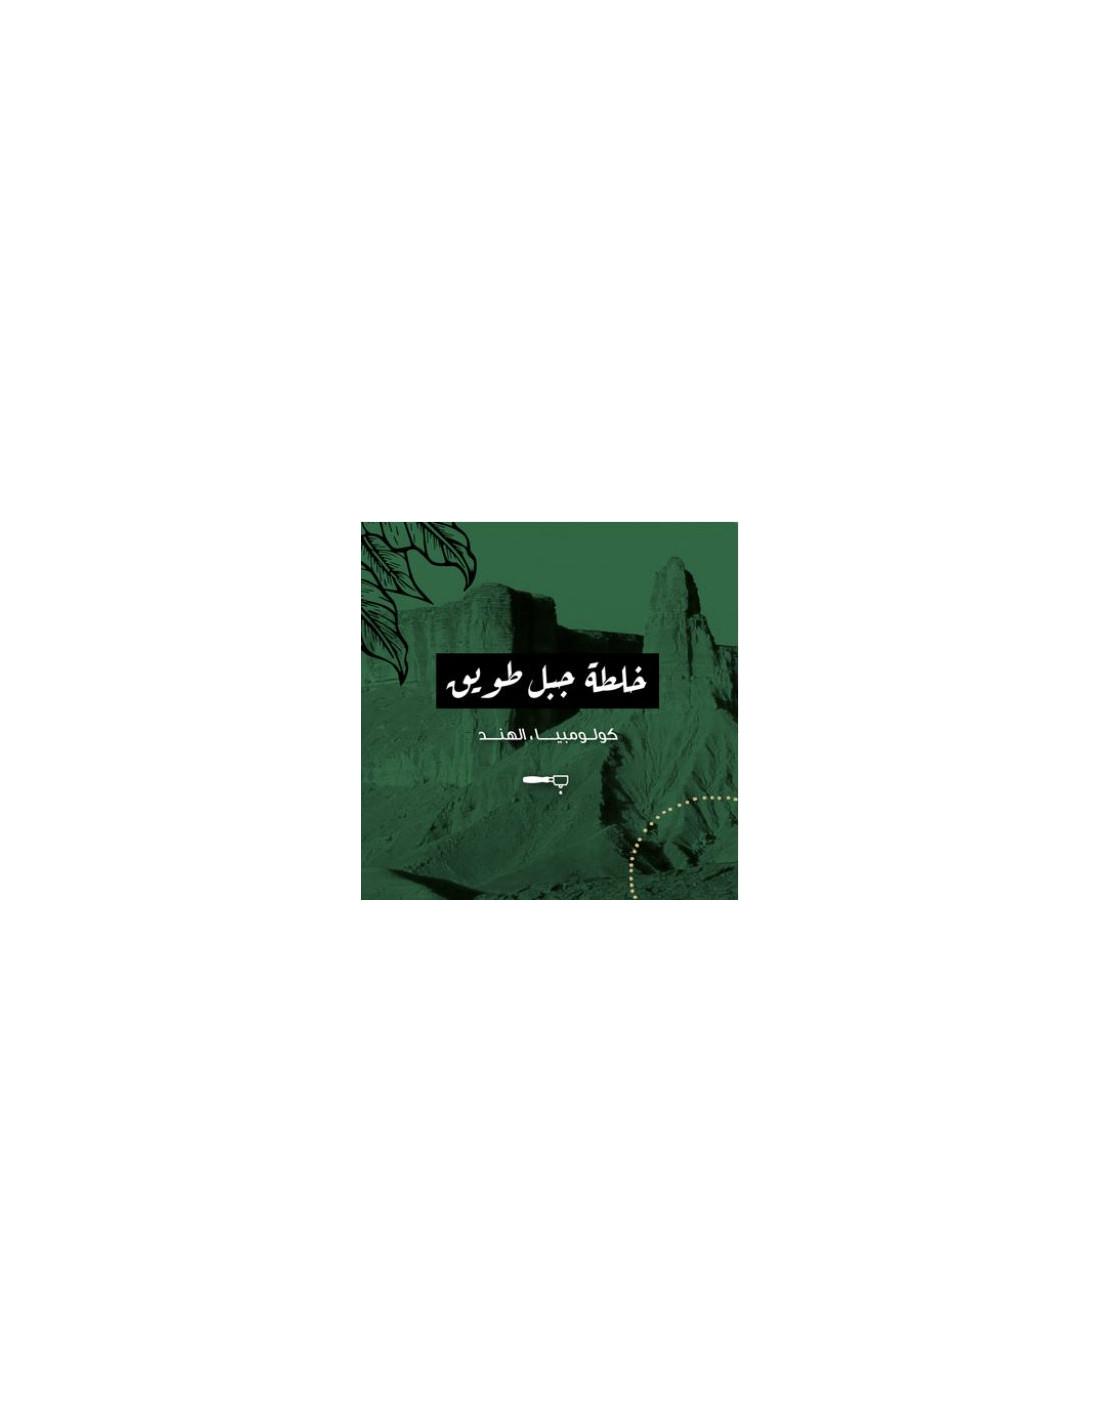 محمصة الرياض جبل طويق F O X C O F F E E